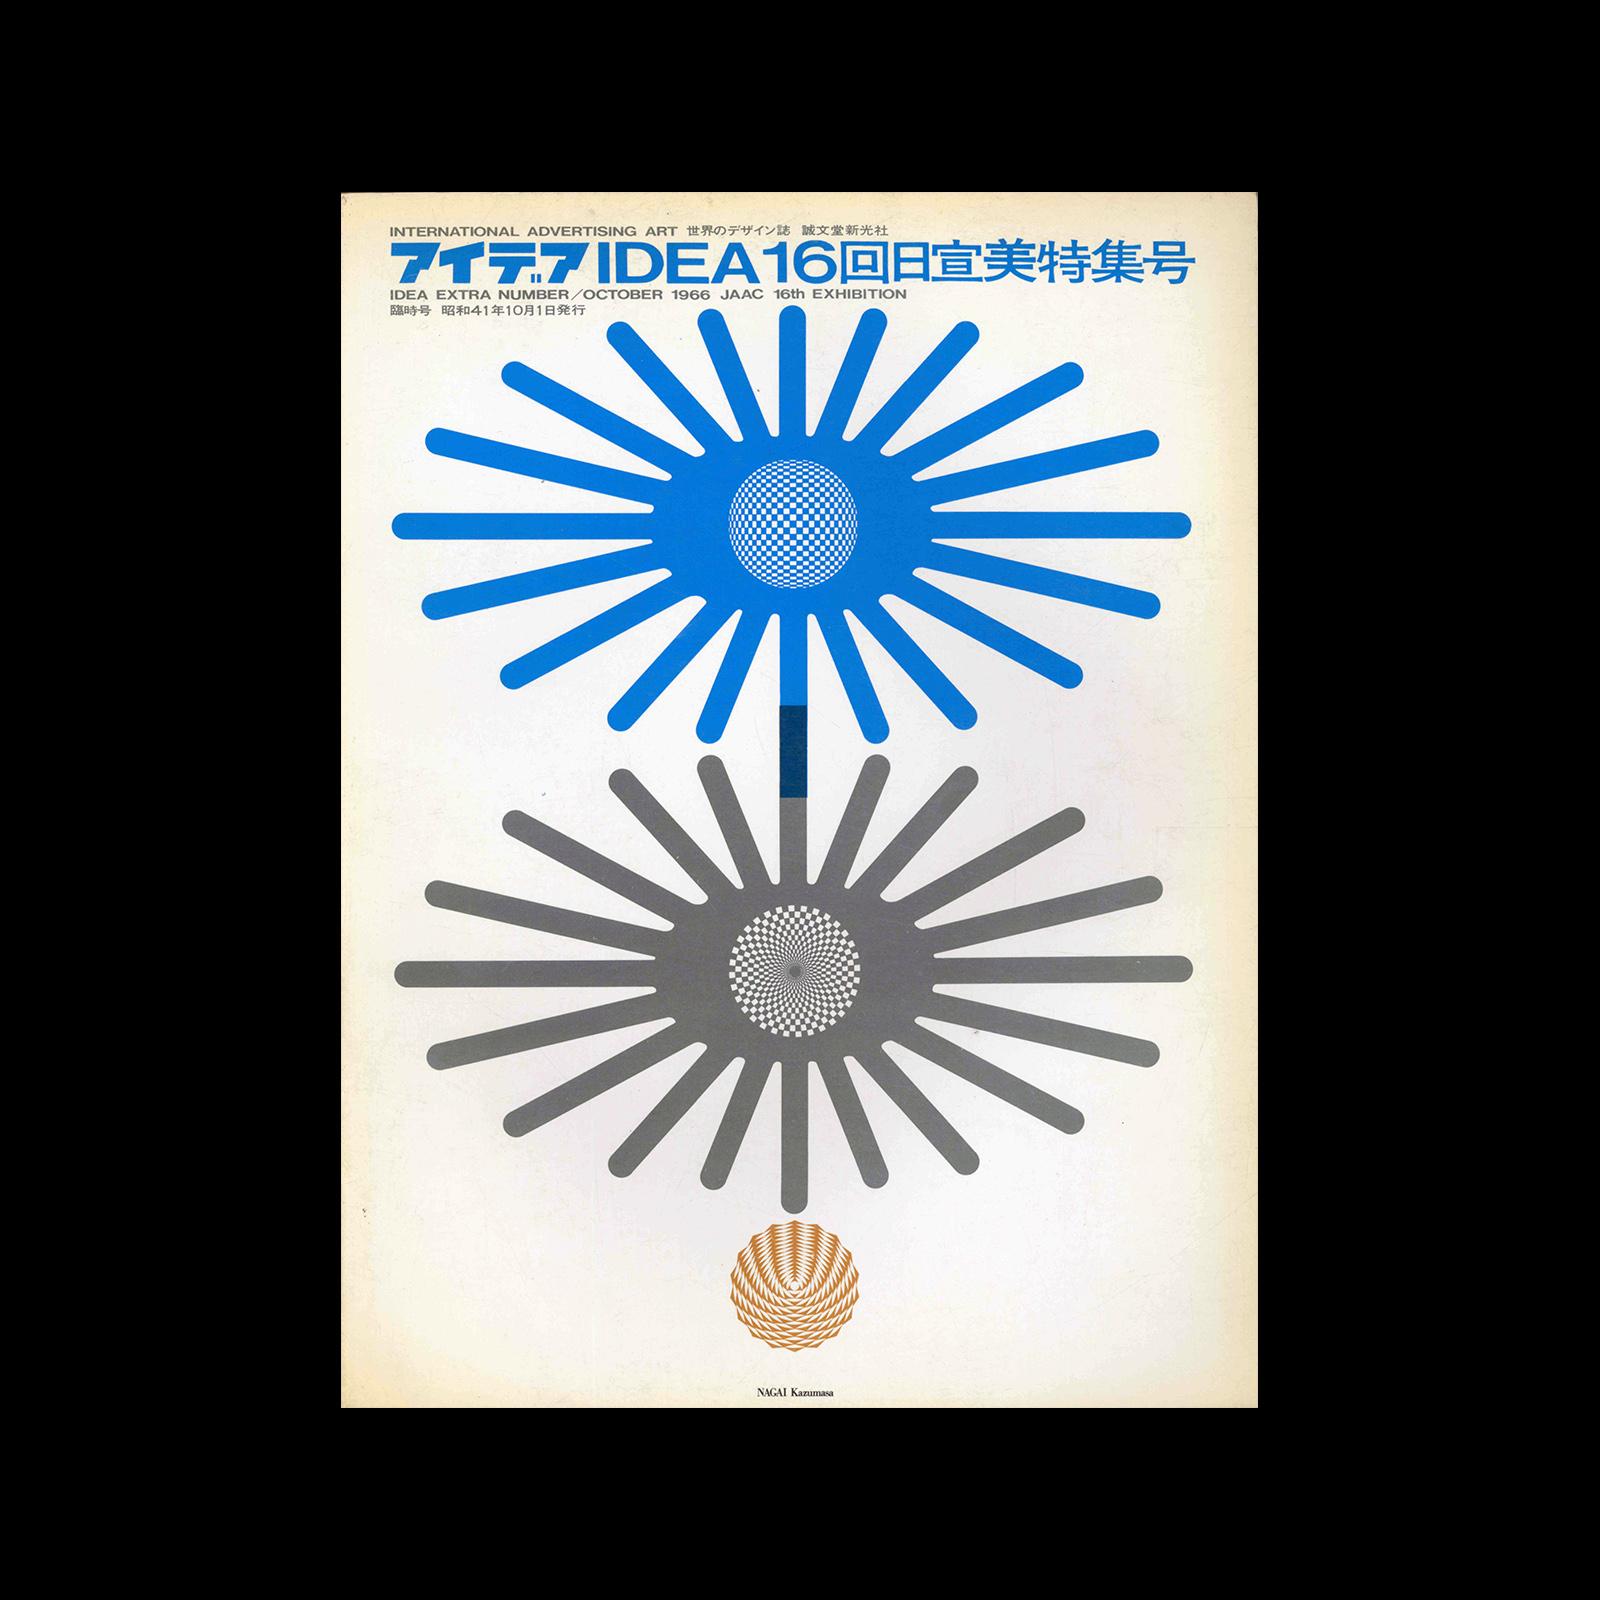 Idea October 1966 Extra issue. Cover design by Kazumasa Nagai.